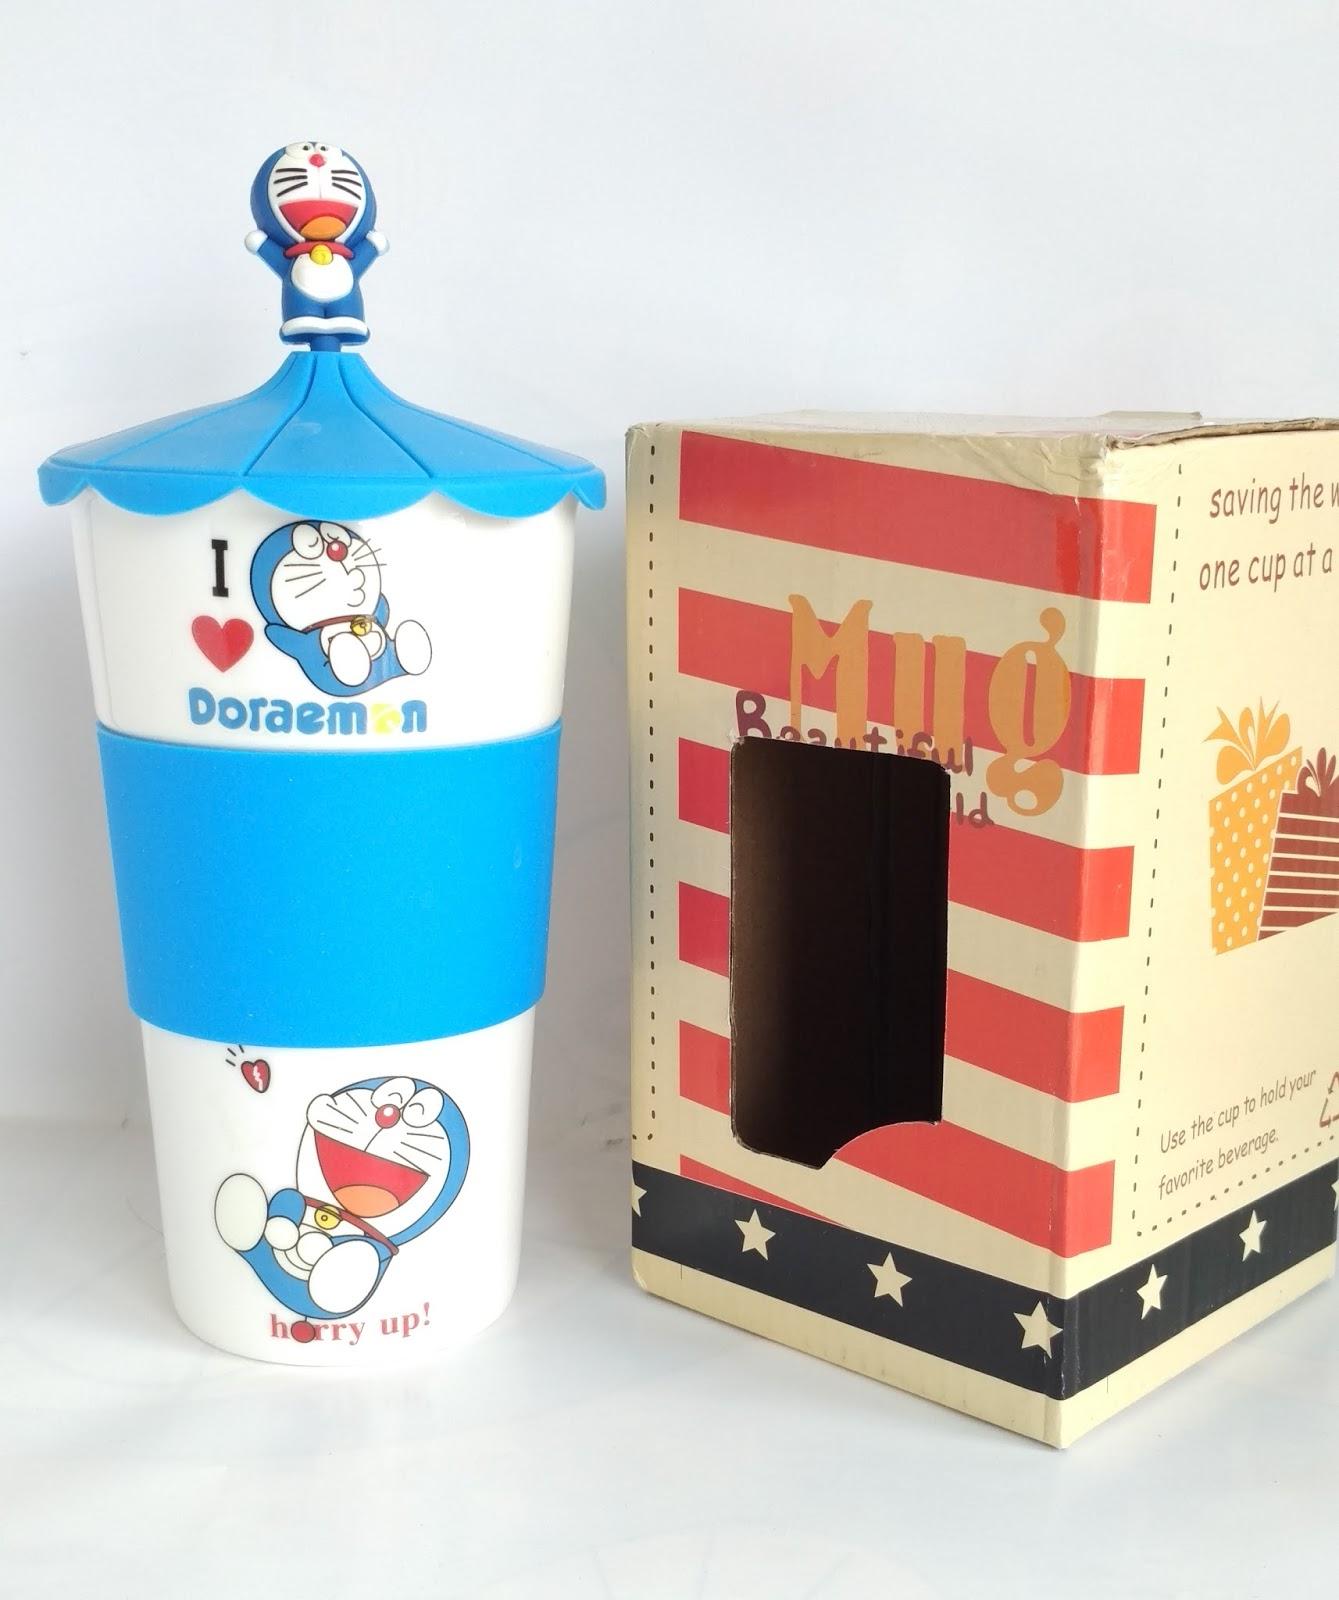 Gelas Keramik Doraemon; gelas doraemon; pernak; pernik doraemon;gelas keramik;mug; doraemon;mug kerami; mug doraemon; pernak pernik doraemon; doraemon collections